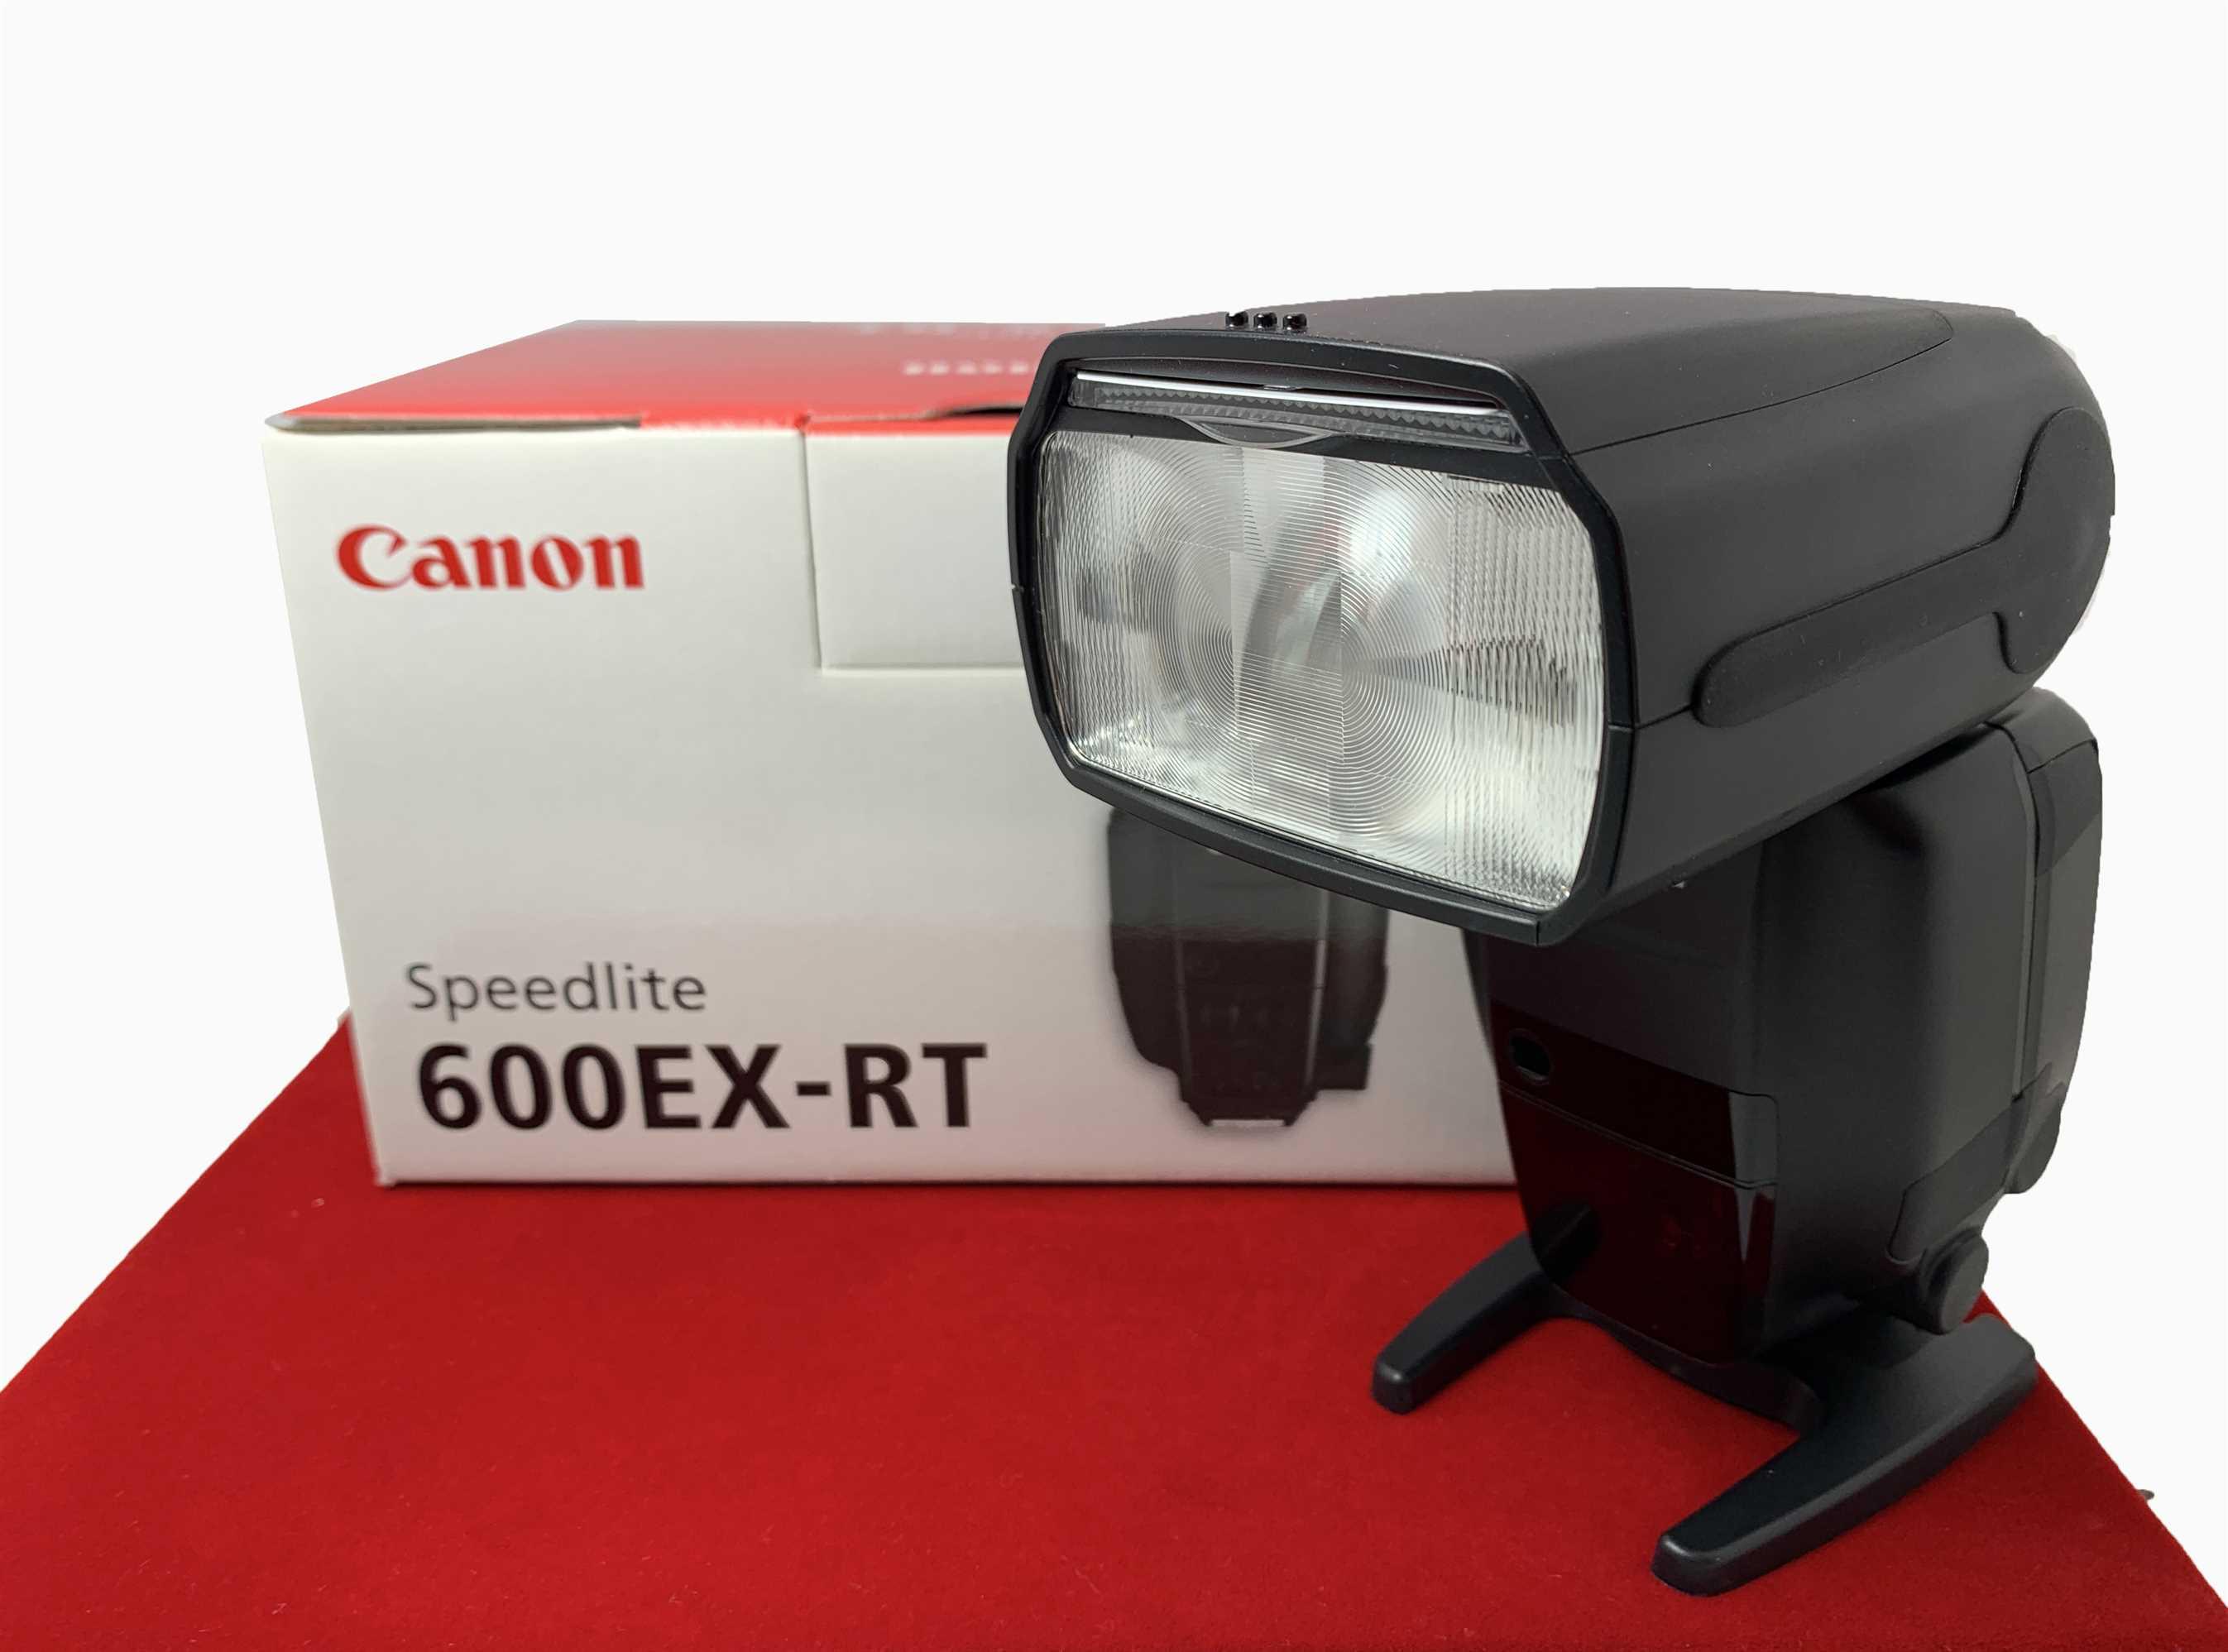 [USED-PJ33] Canon 600 EX-RT Speedlite,95% Like New Condition,(S/N:4513101260)